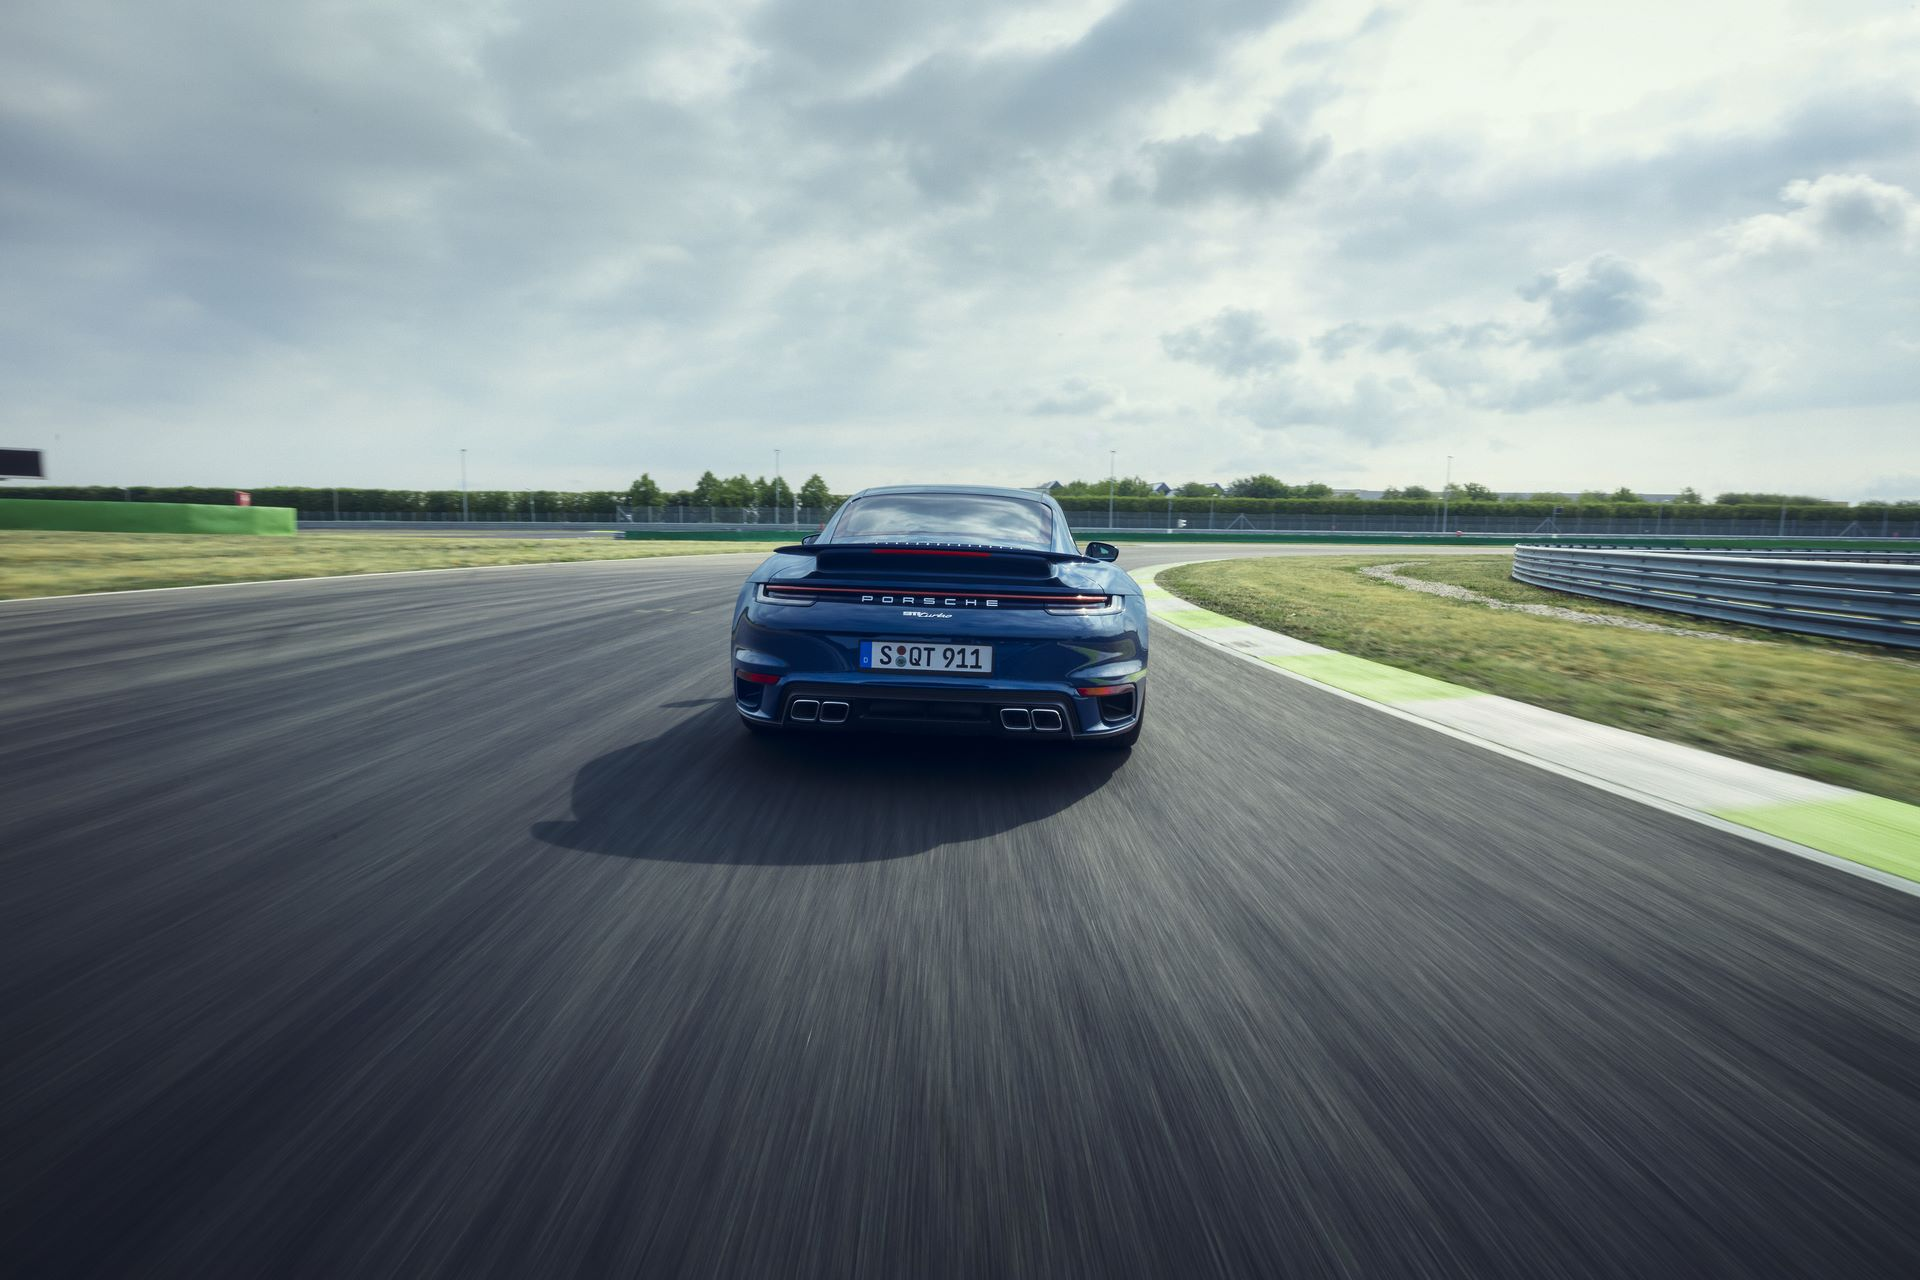 Porsche-911-Turbo-2020-5